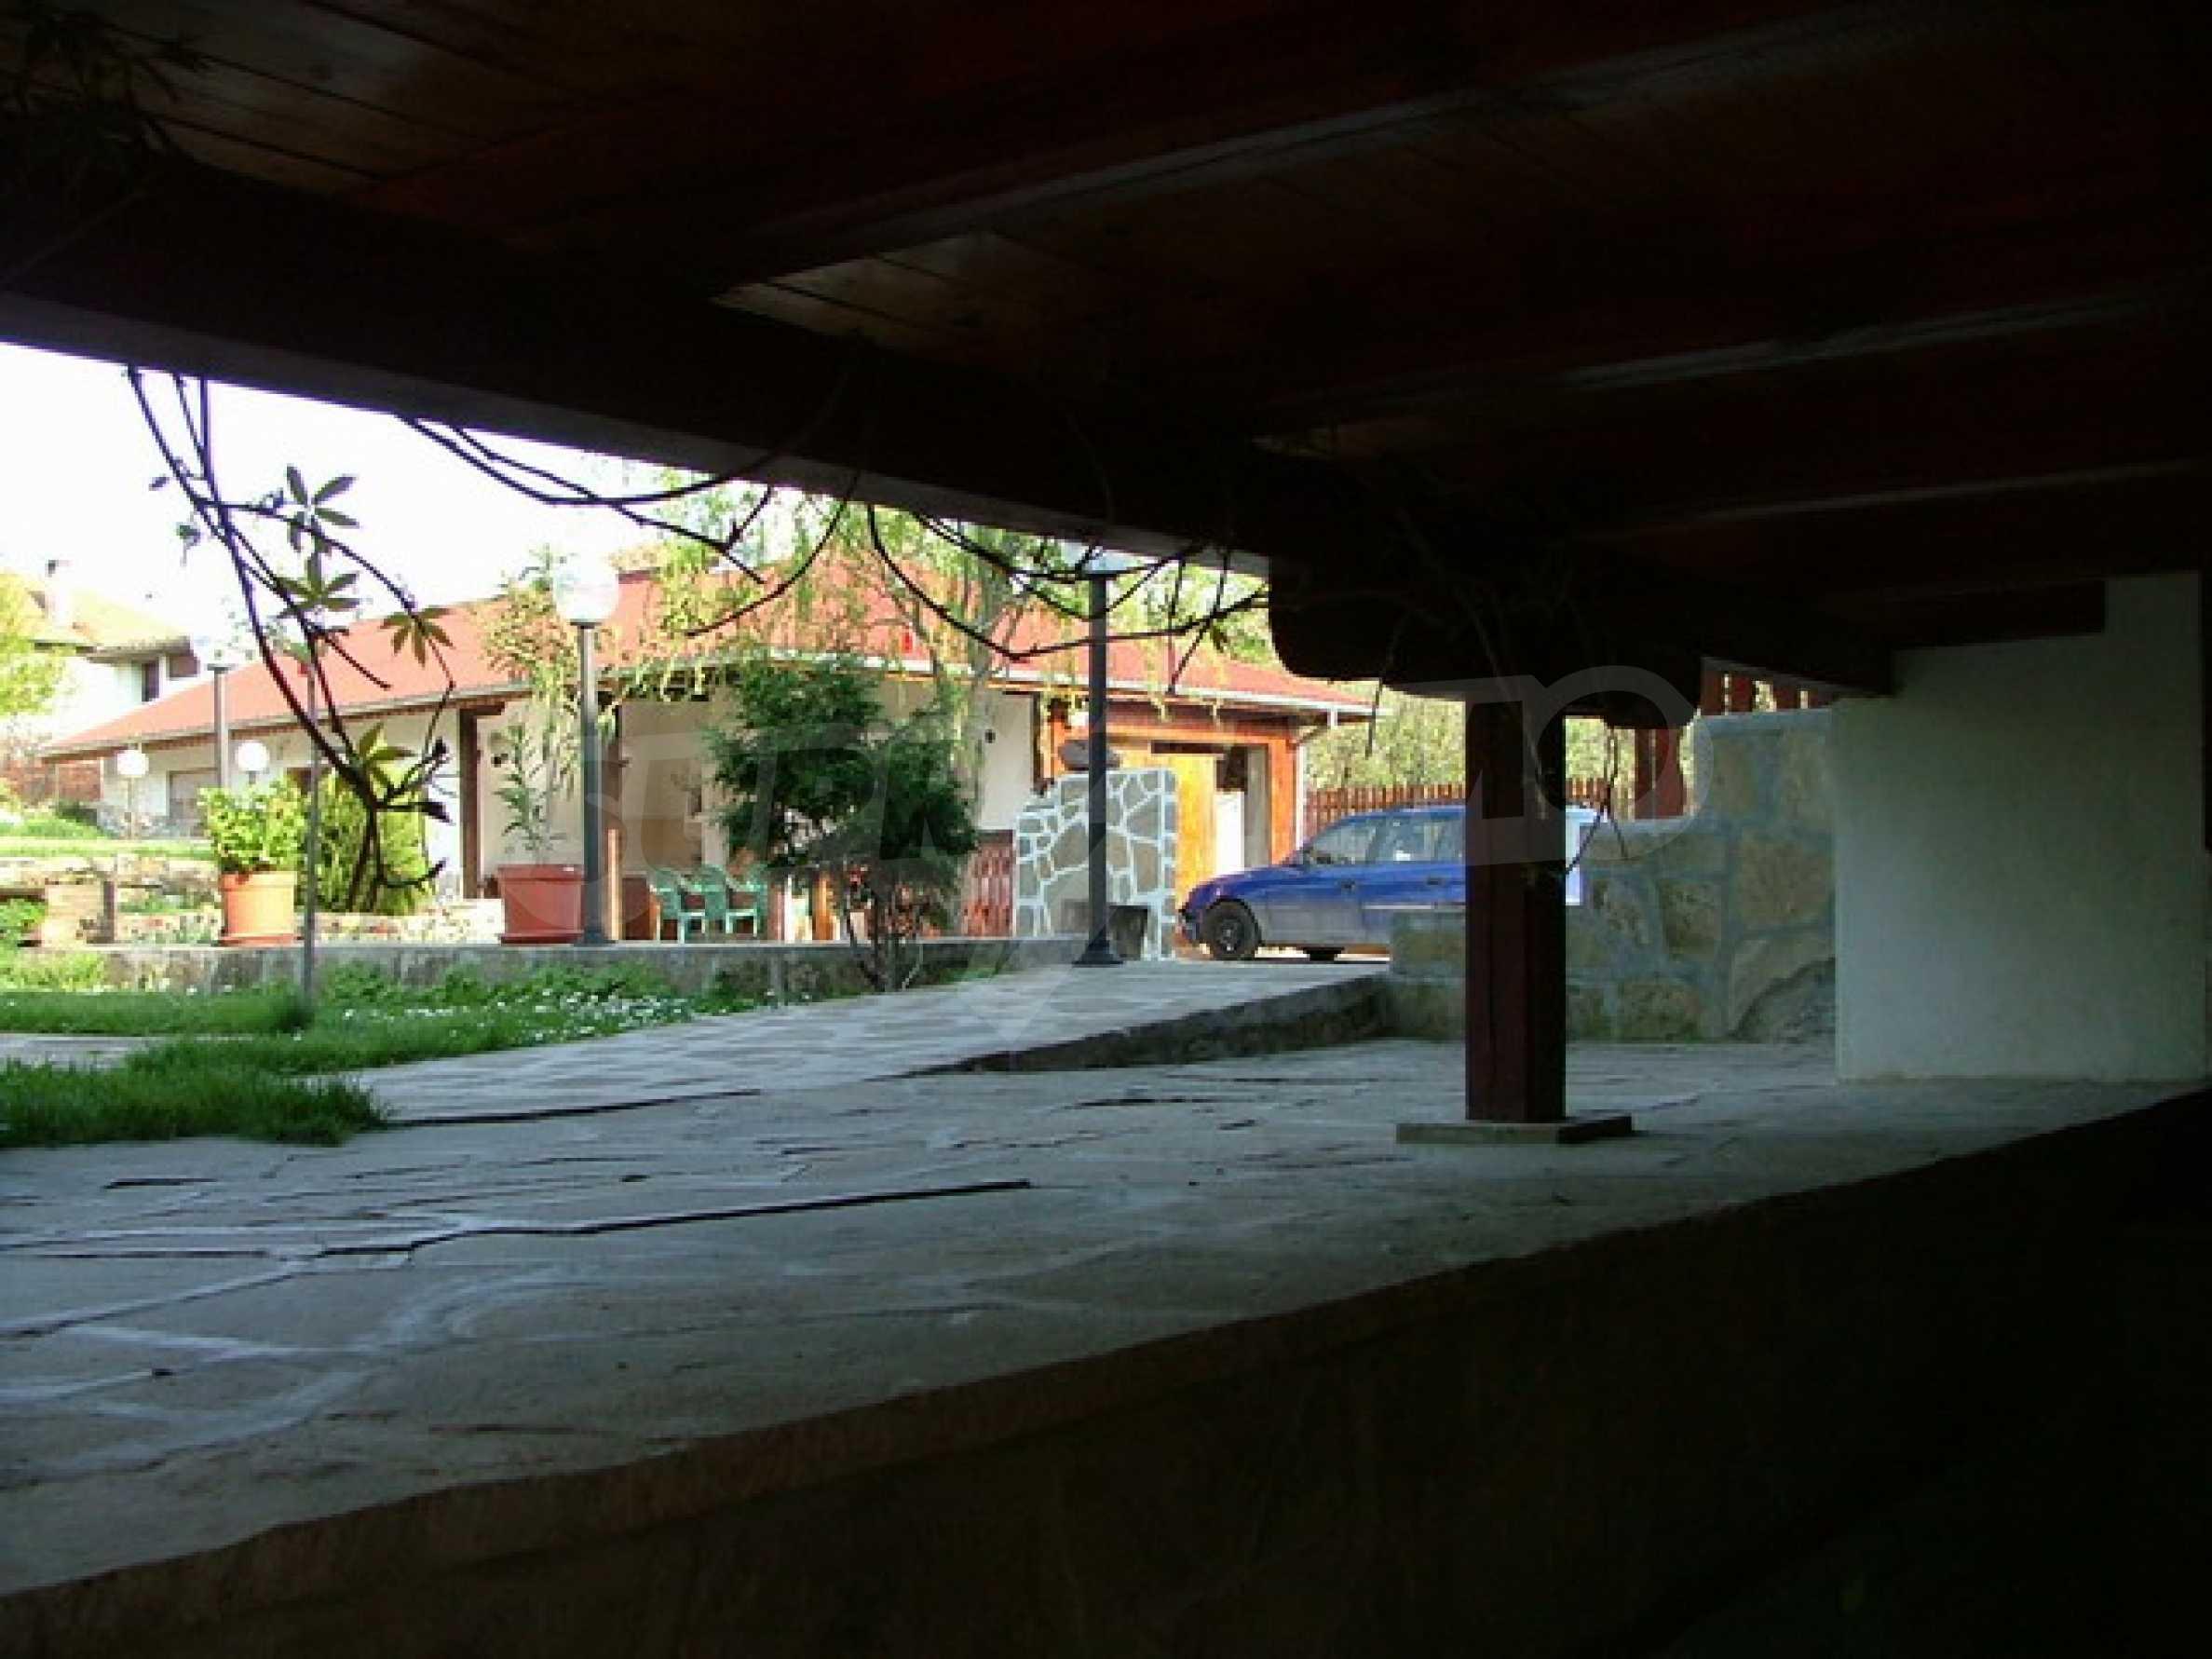 Stilvoll renovierte Villa 12 km entfernt. von Veliko Tarnovo 20